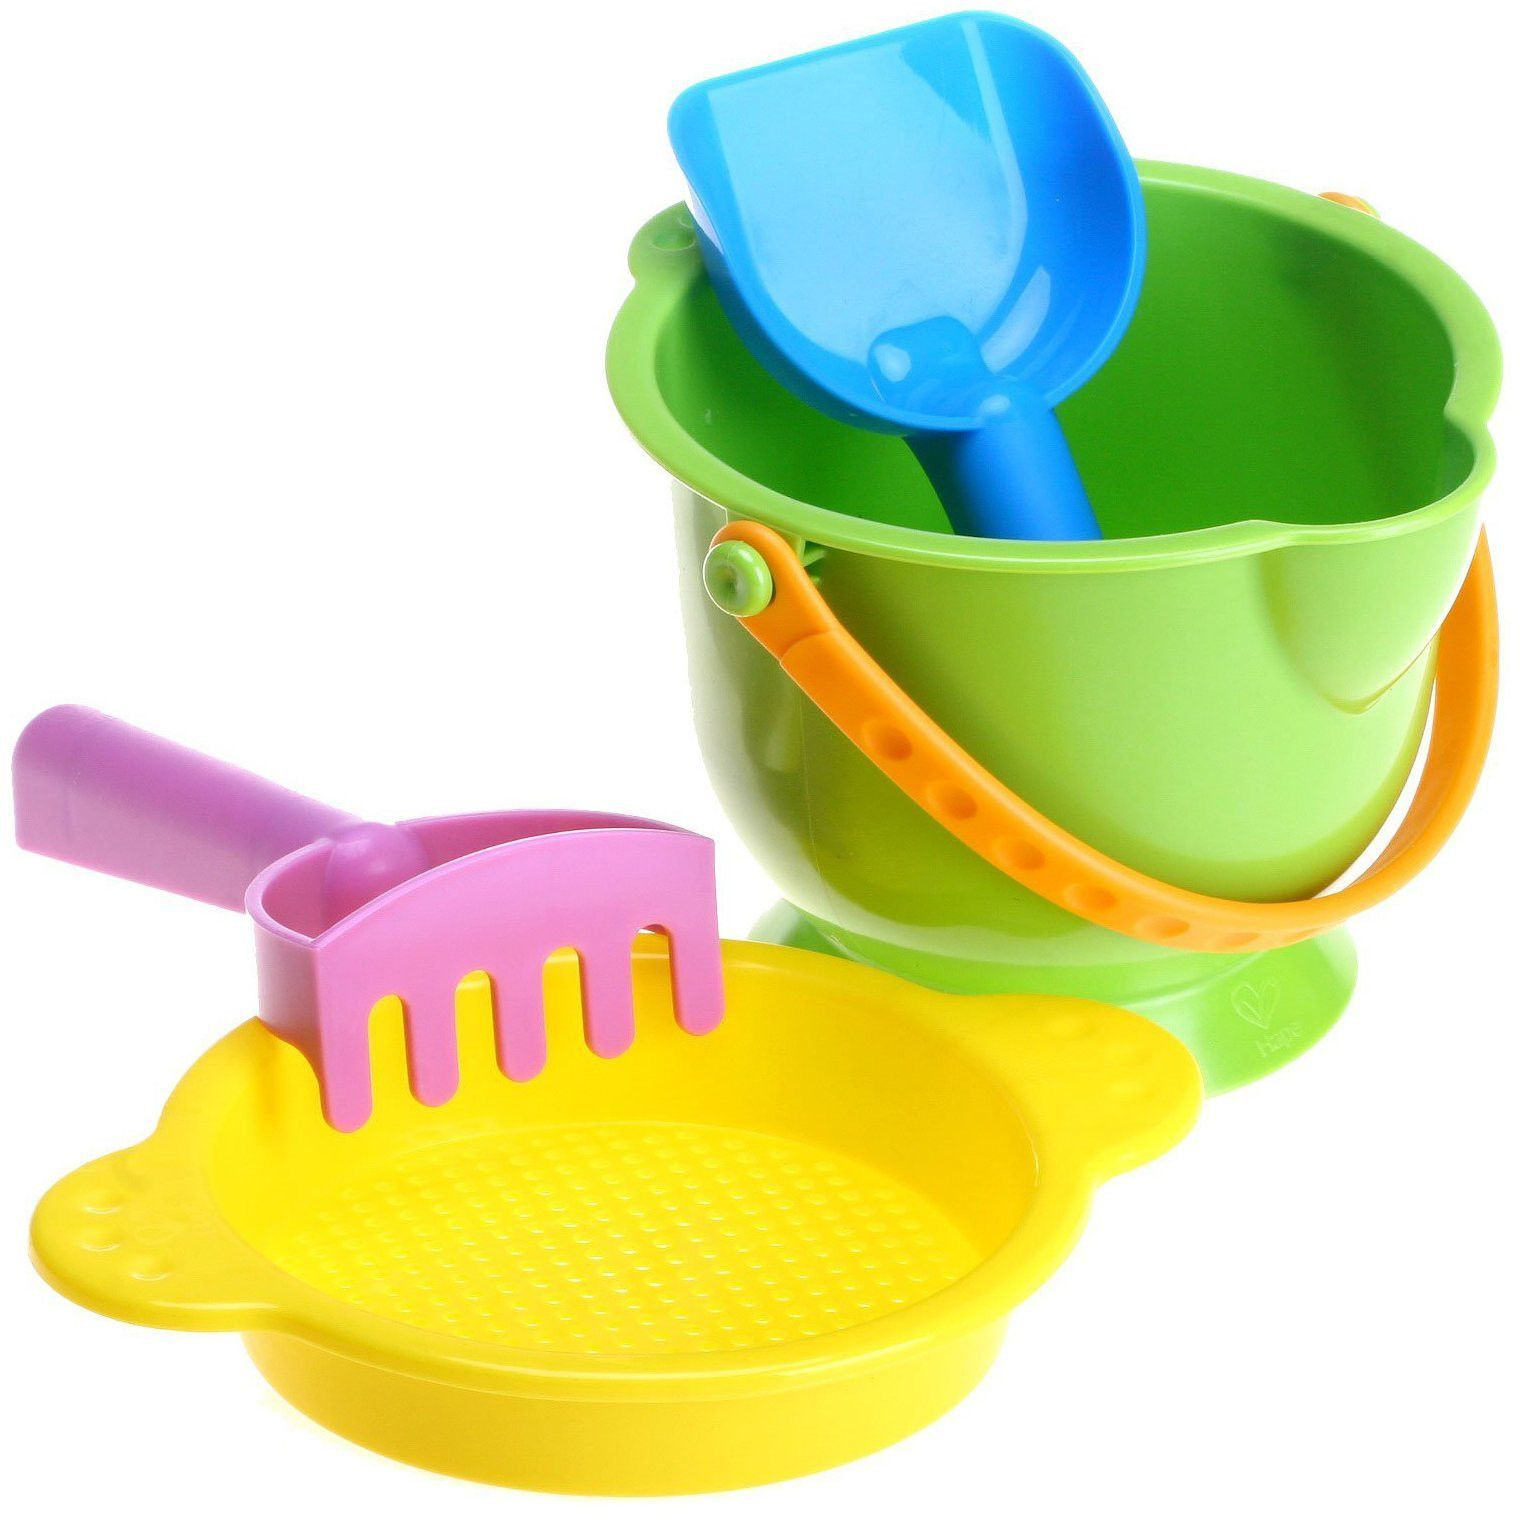 Hape sand u sun beach basics set products pinterest products